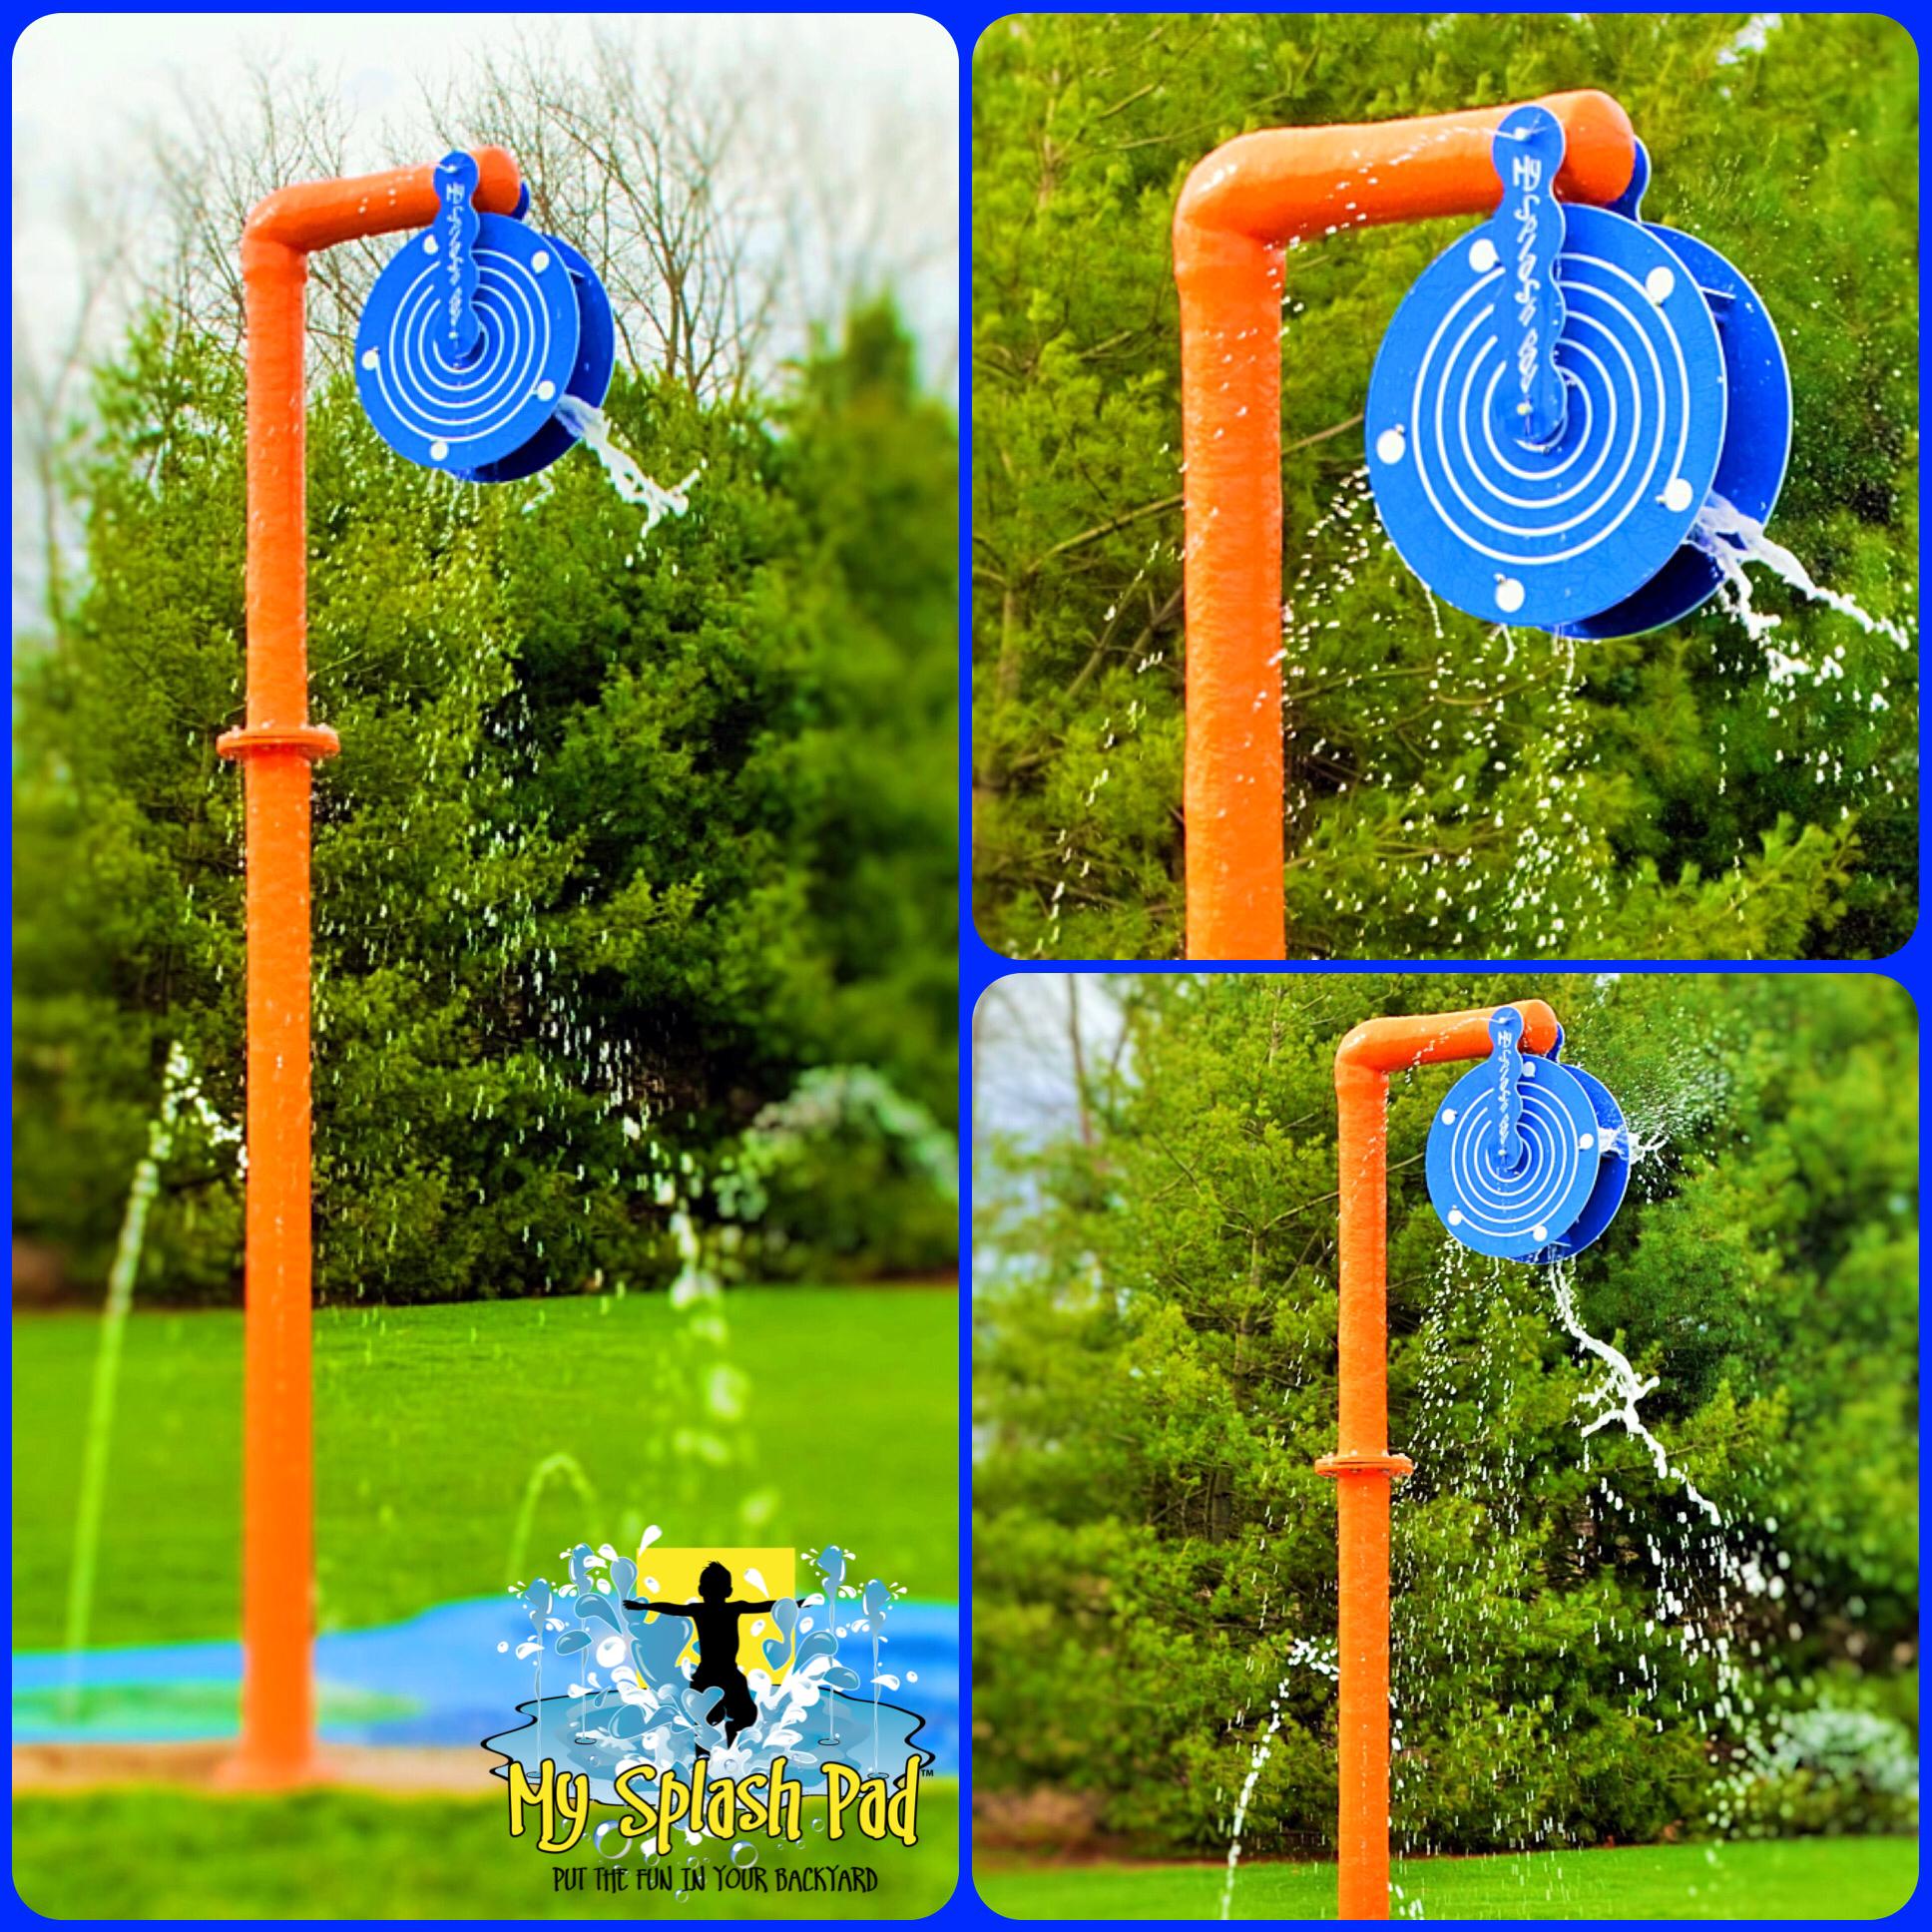 Pelham Manor, New York Splash Pad (With images)   Splash ...